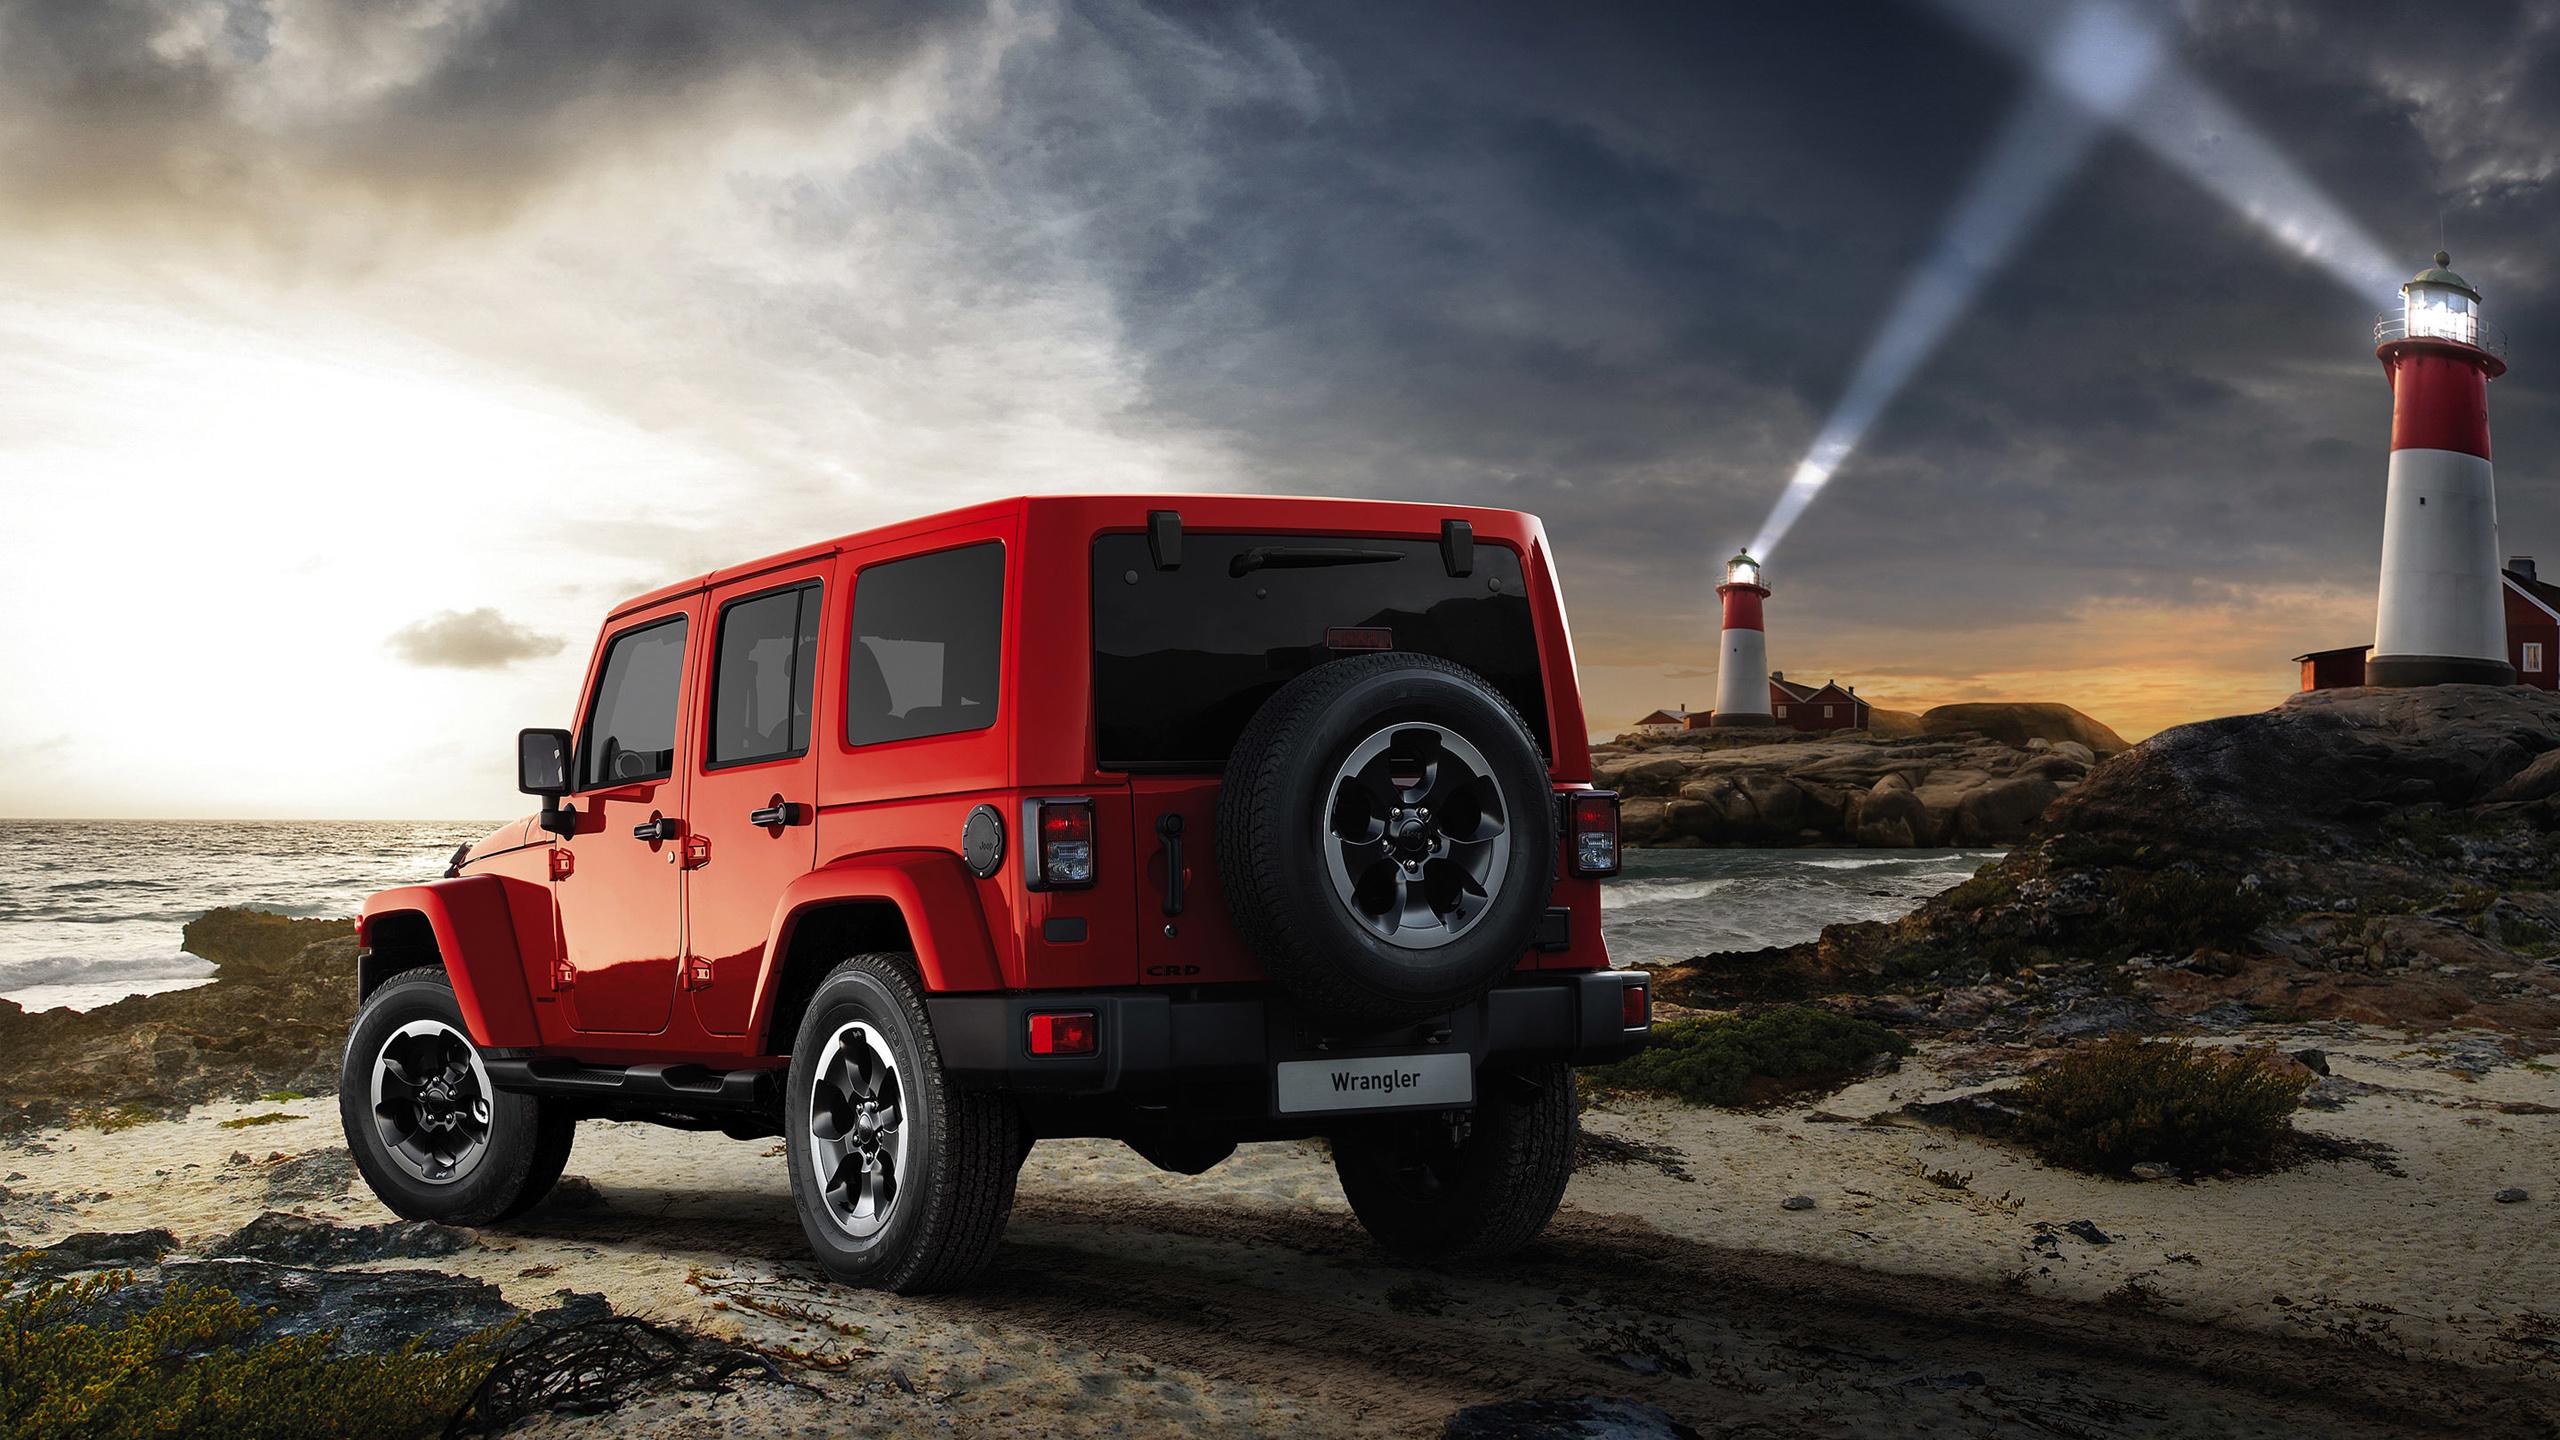 Top 20 Jeep Wrangler Wallpapers